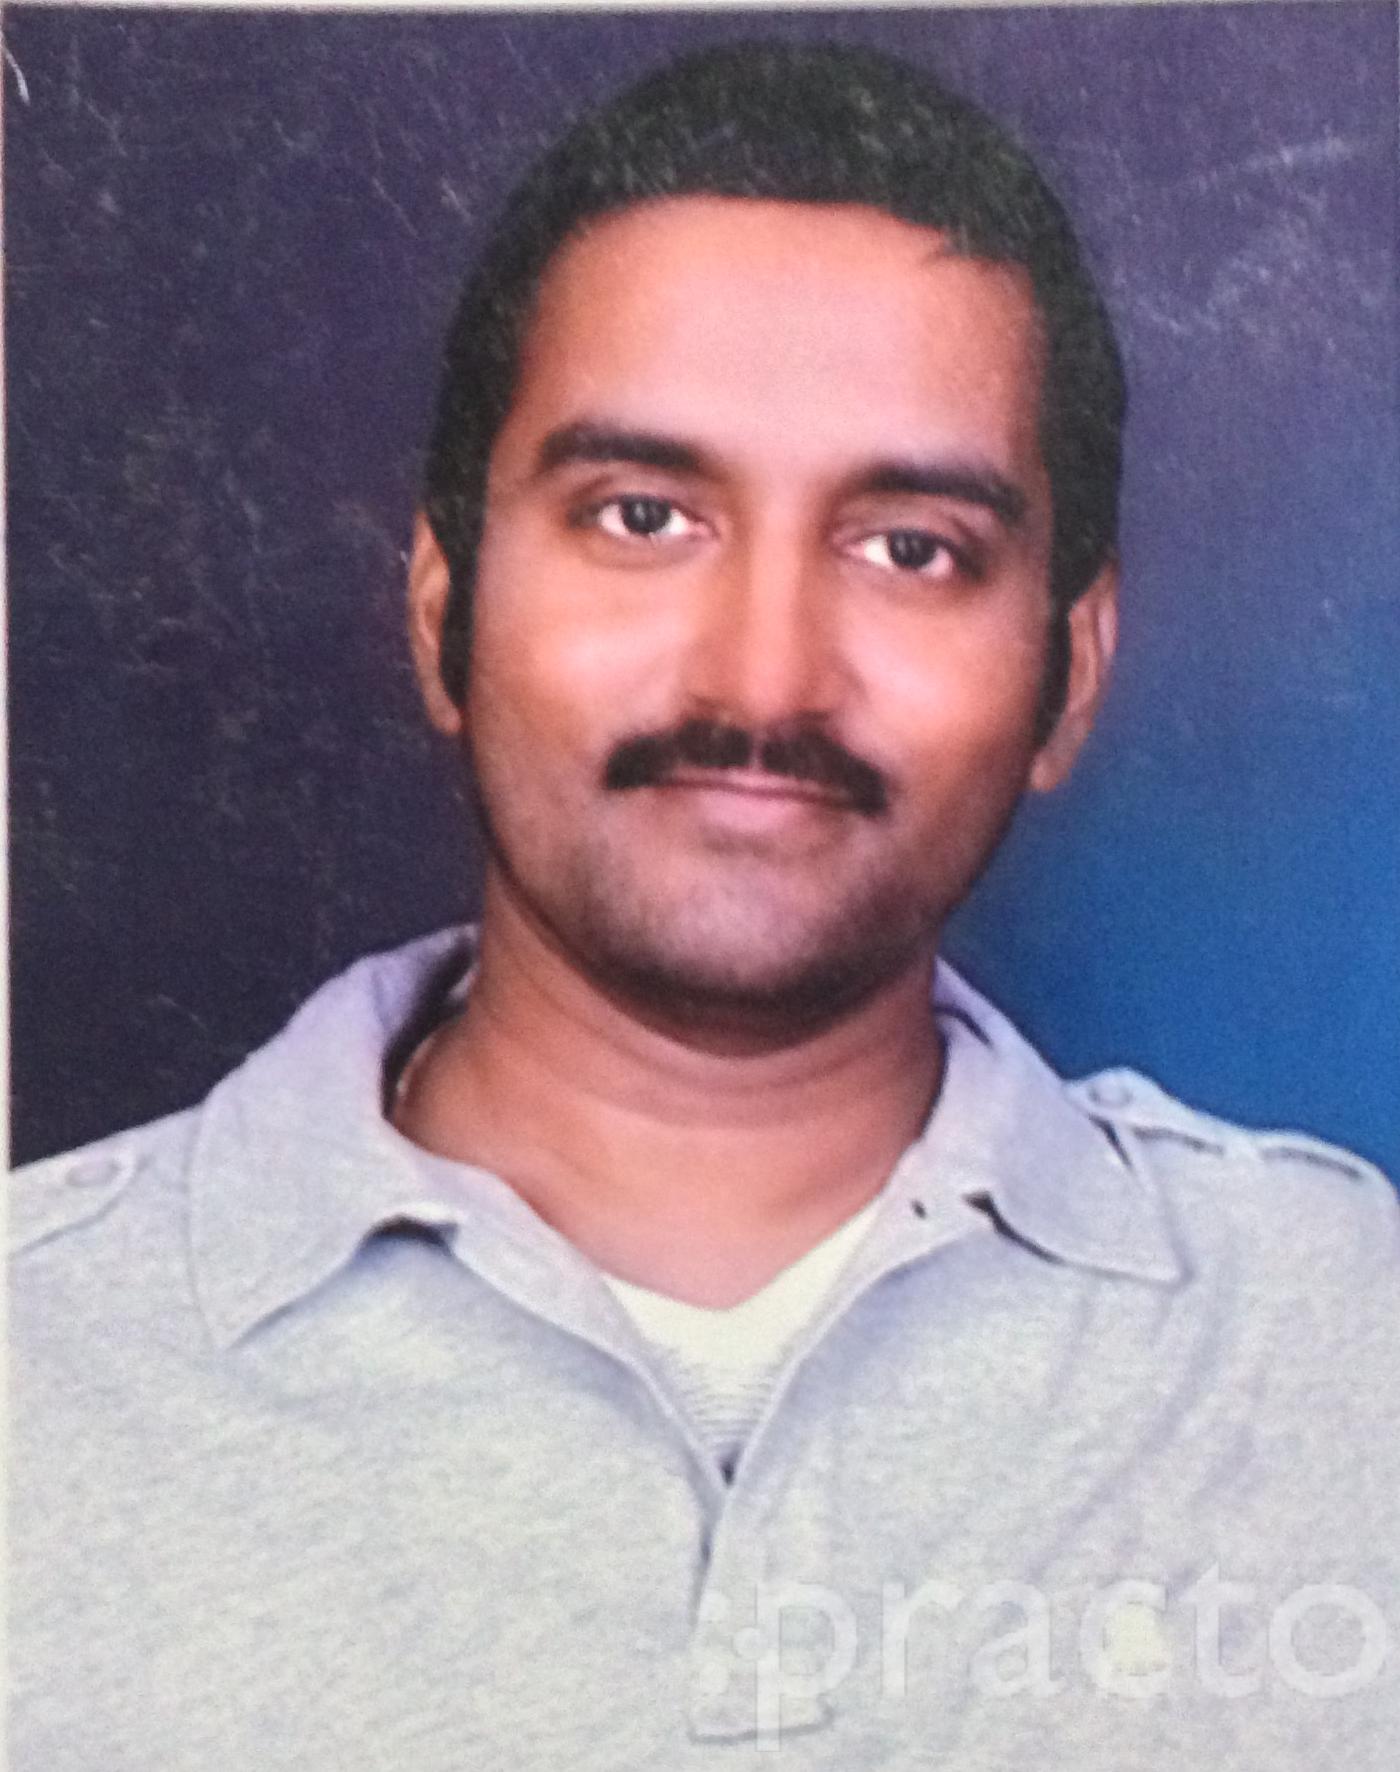 Dr. Arisetty Srikant - Pediatrician